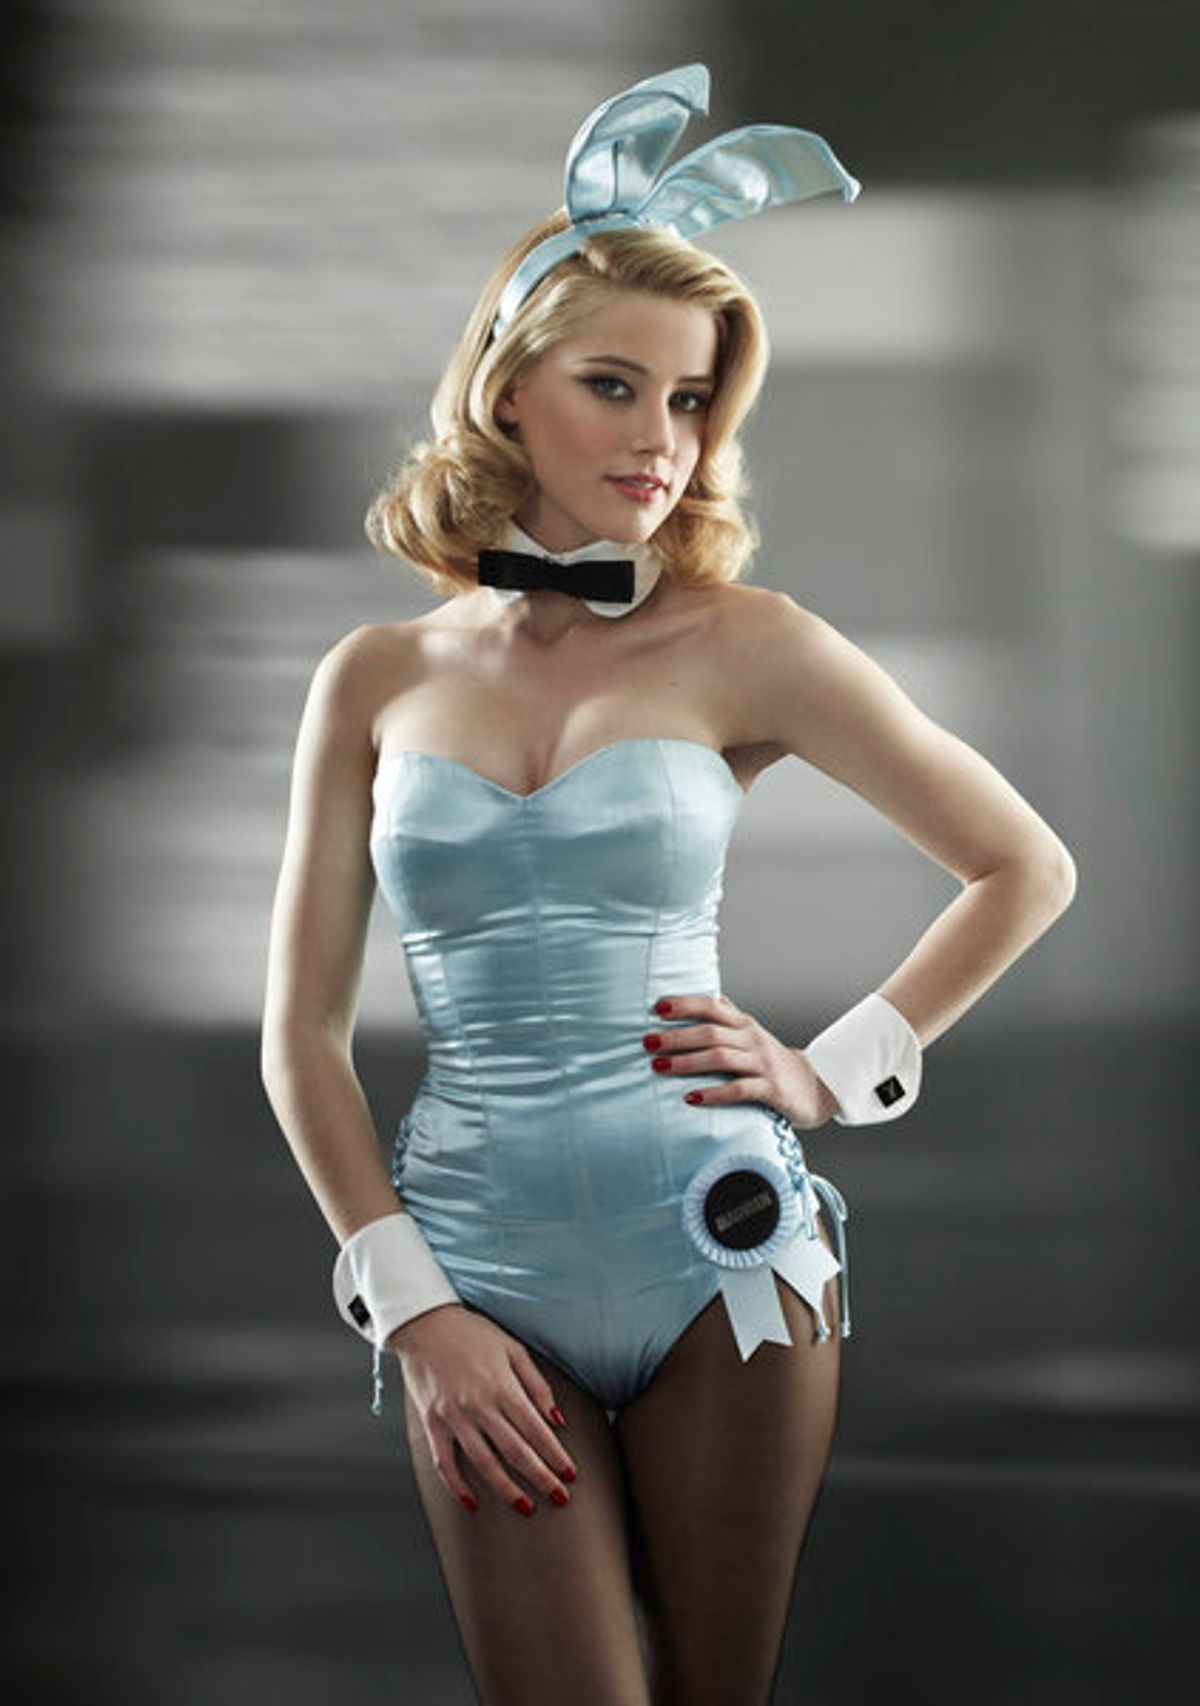 THE PLAYBOY CLUB -- Season: Pilot -- Pictured: Amber Heard as Maureen -- Photo by: John Russo/NBC  (John Russo)